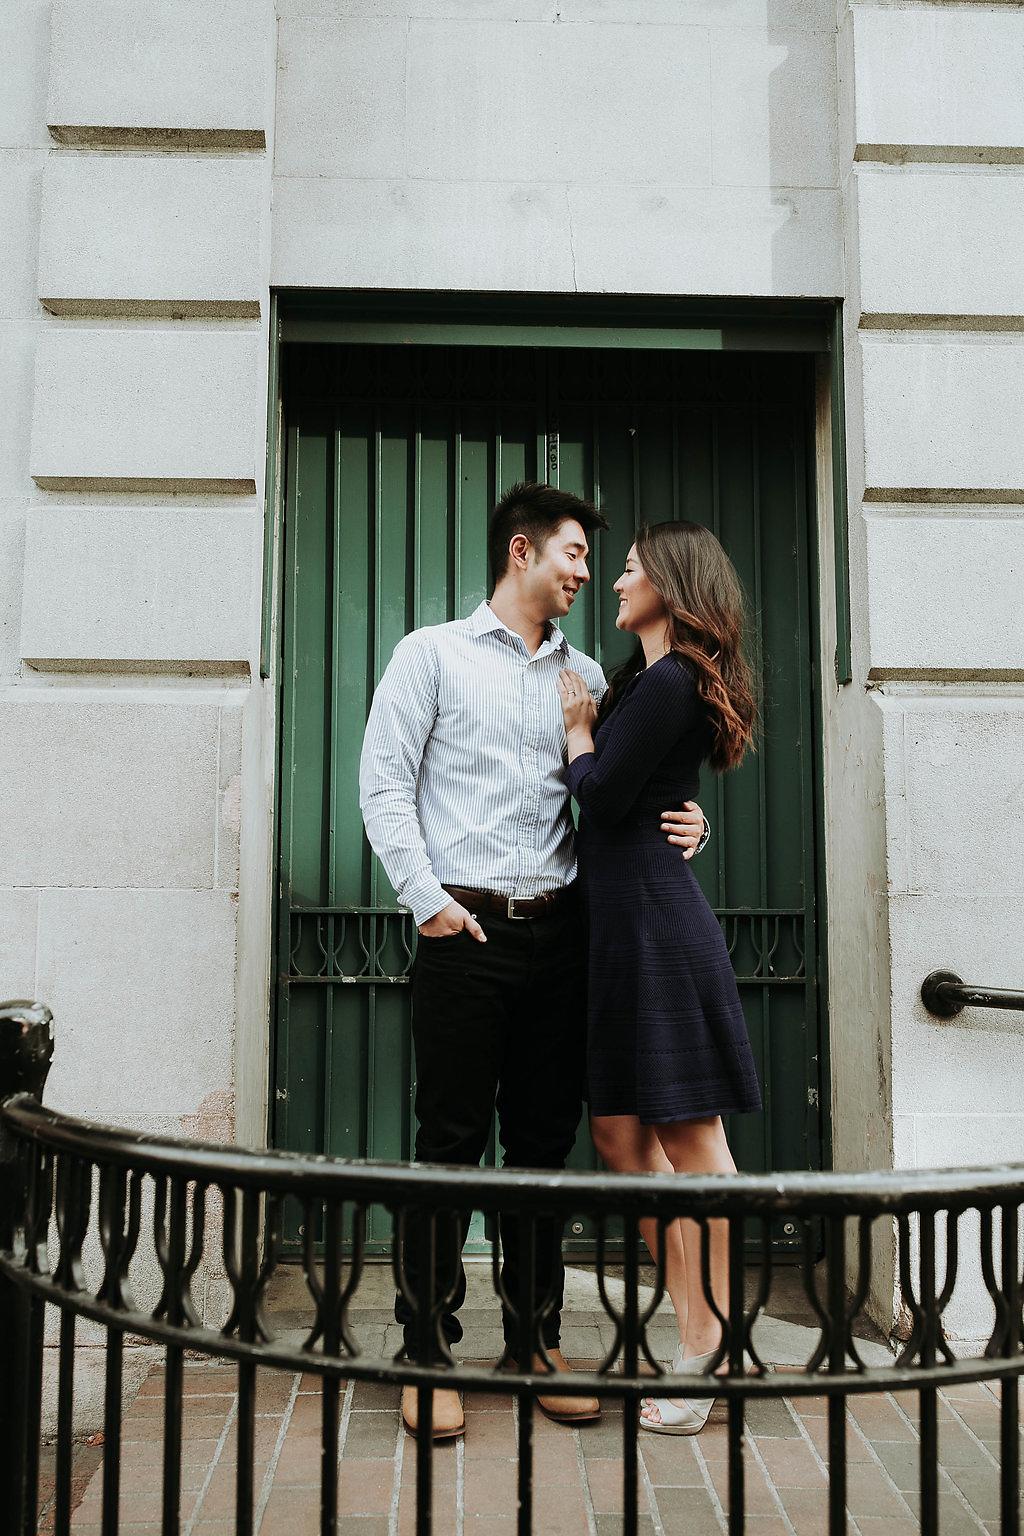 Pioneer_Square_engagement_Photos_Michelle+David_Seattle_by_Adina_Preston_Weddings_17.JPG